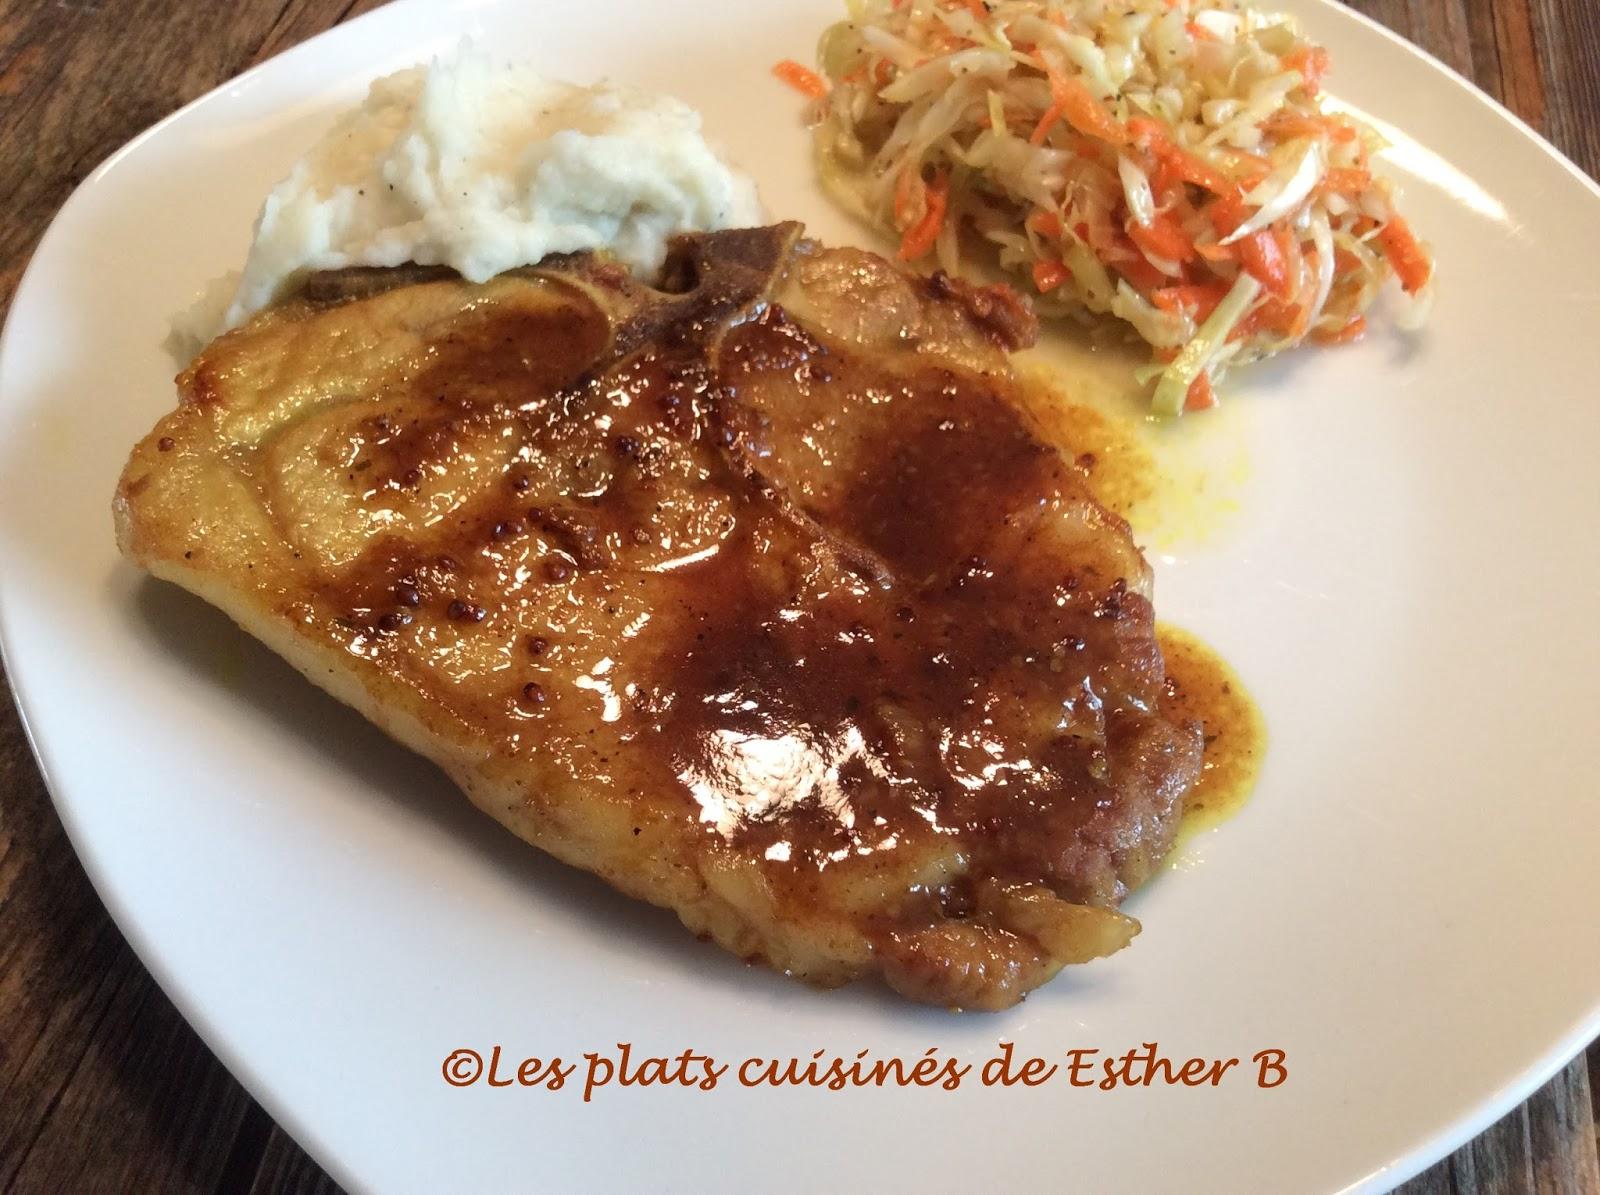 Les plats cuisin s de esther b c telettes de porc l for Plats cuisines marie